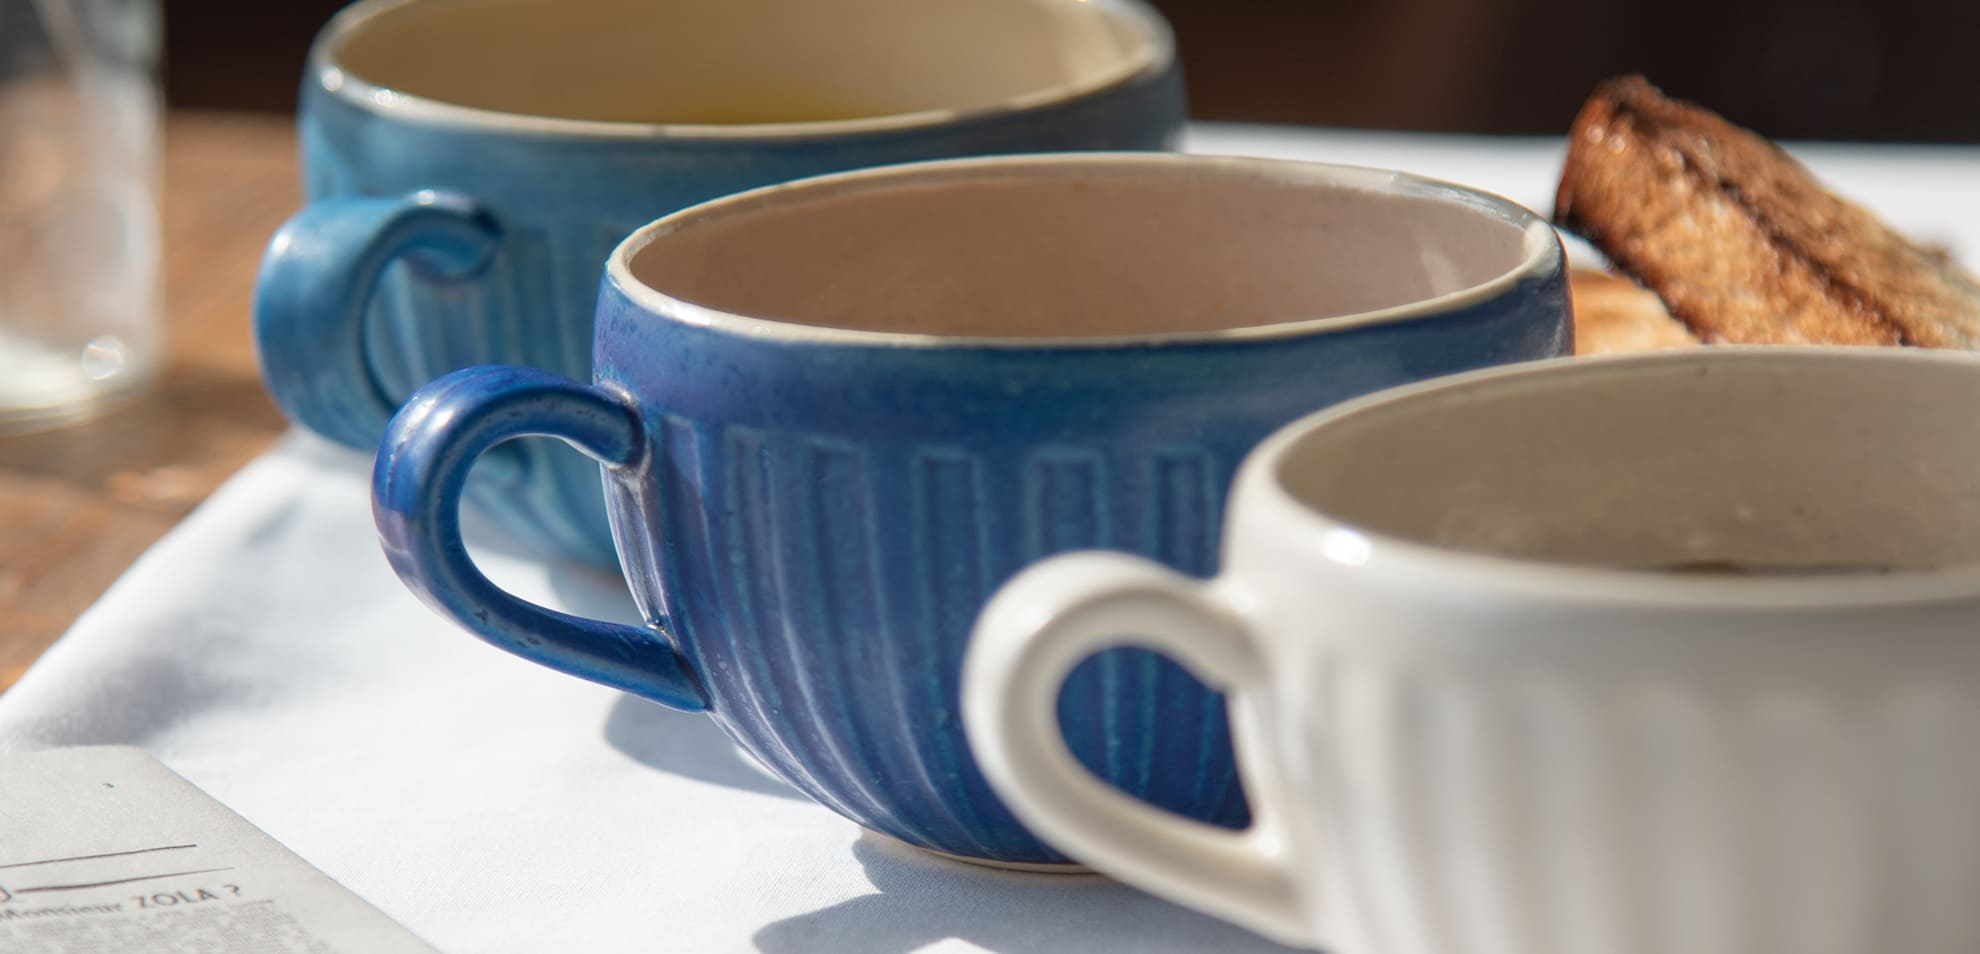 SINOGI Soup cup